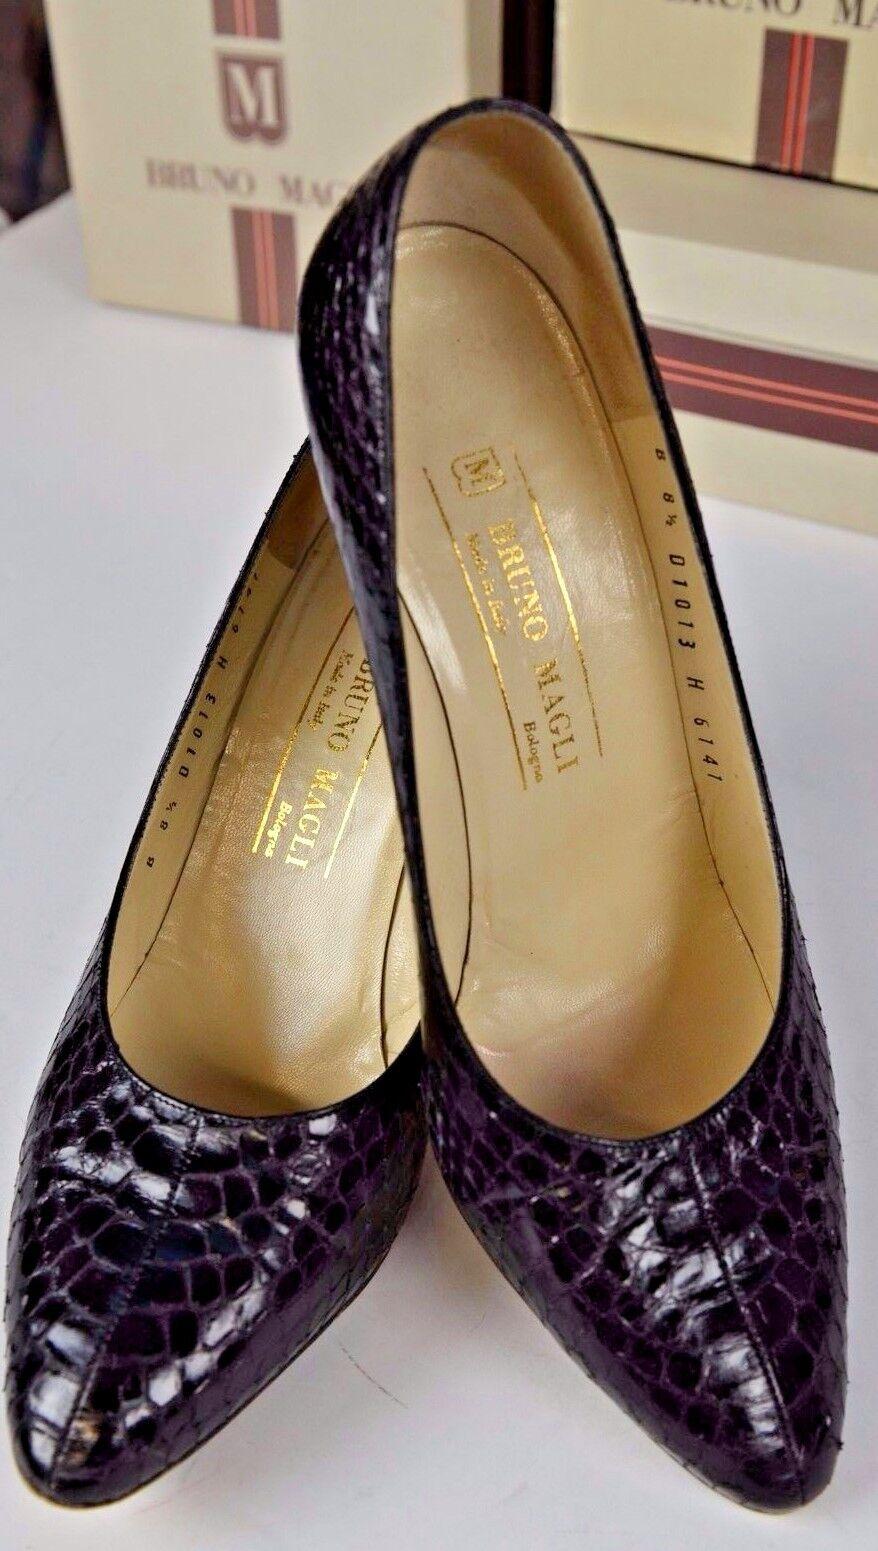 Bruno Magli High Heel Snake Skin Print Leather Heels Size 8.5 Career Black Cute